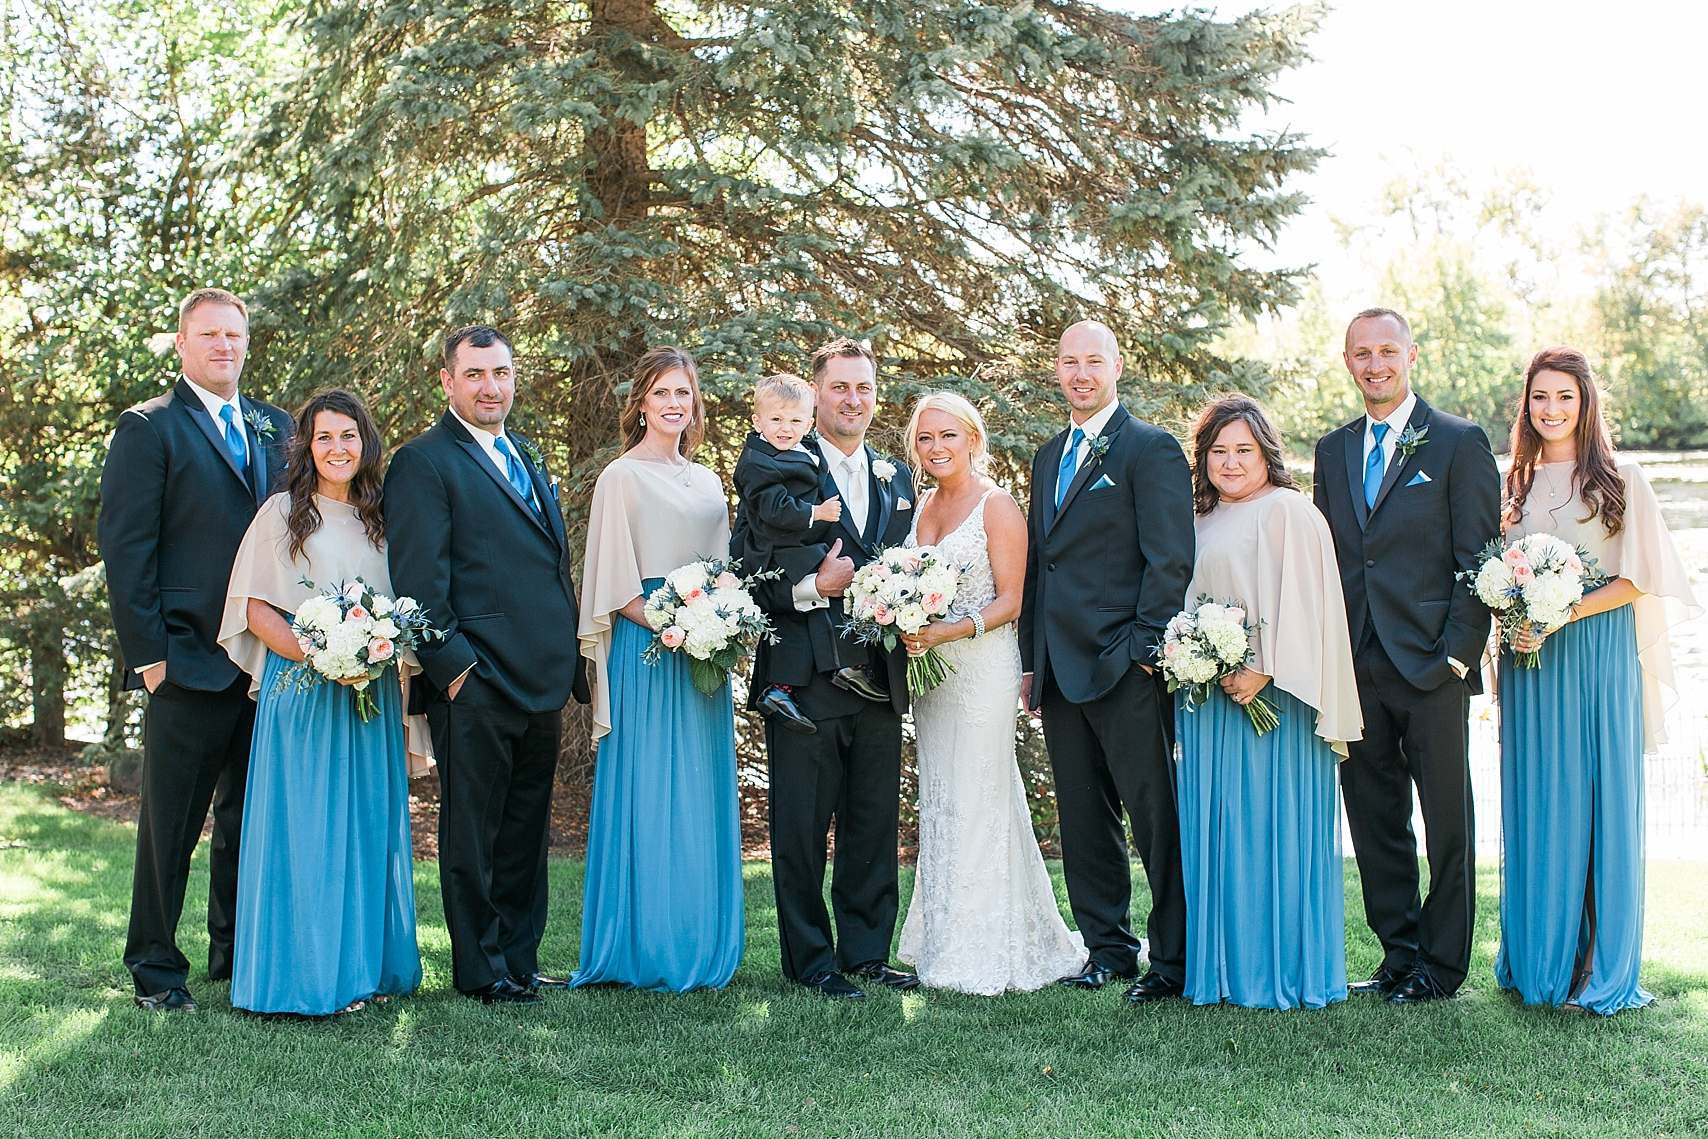 Wedding party black suits blue dresses on wedding day at the Chart House Summer Wedding Lakeville Minnesota Minneapolis Wedding Photographer Mallory Kiesow